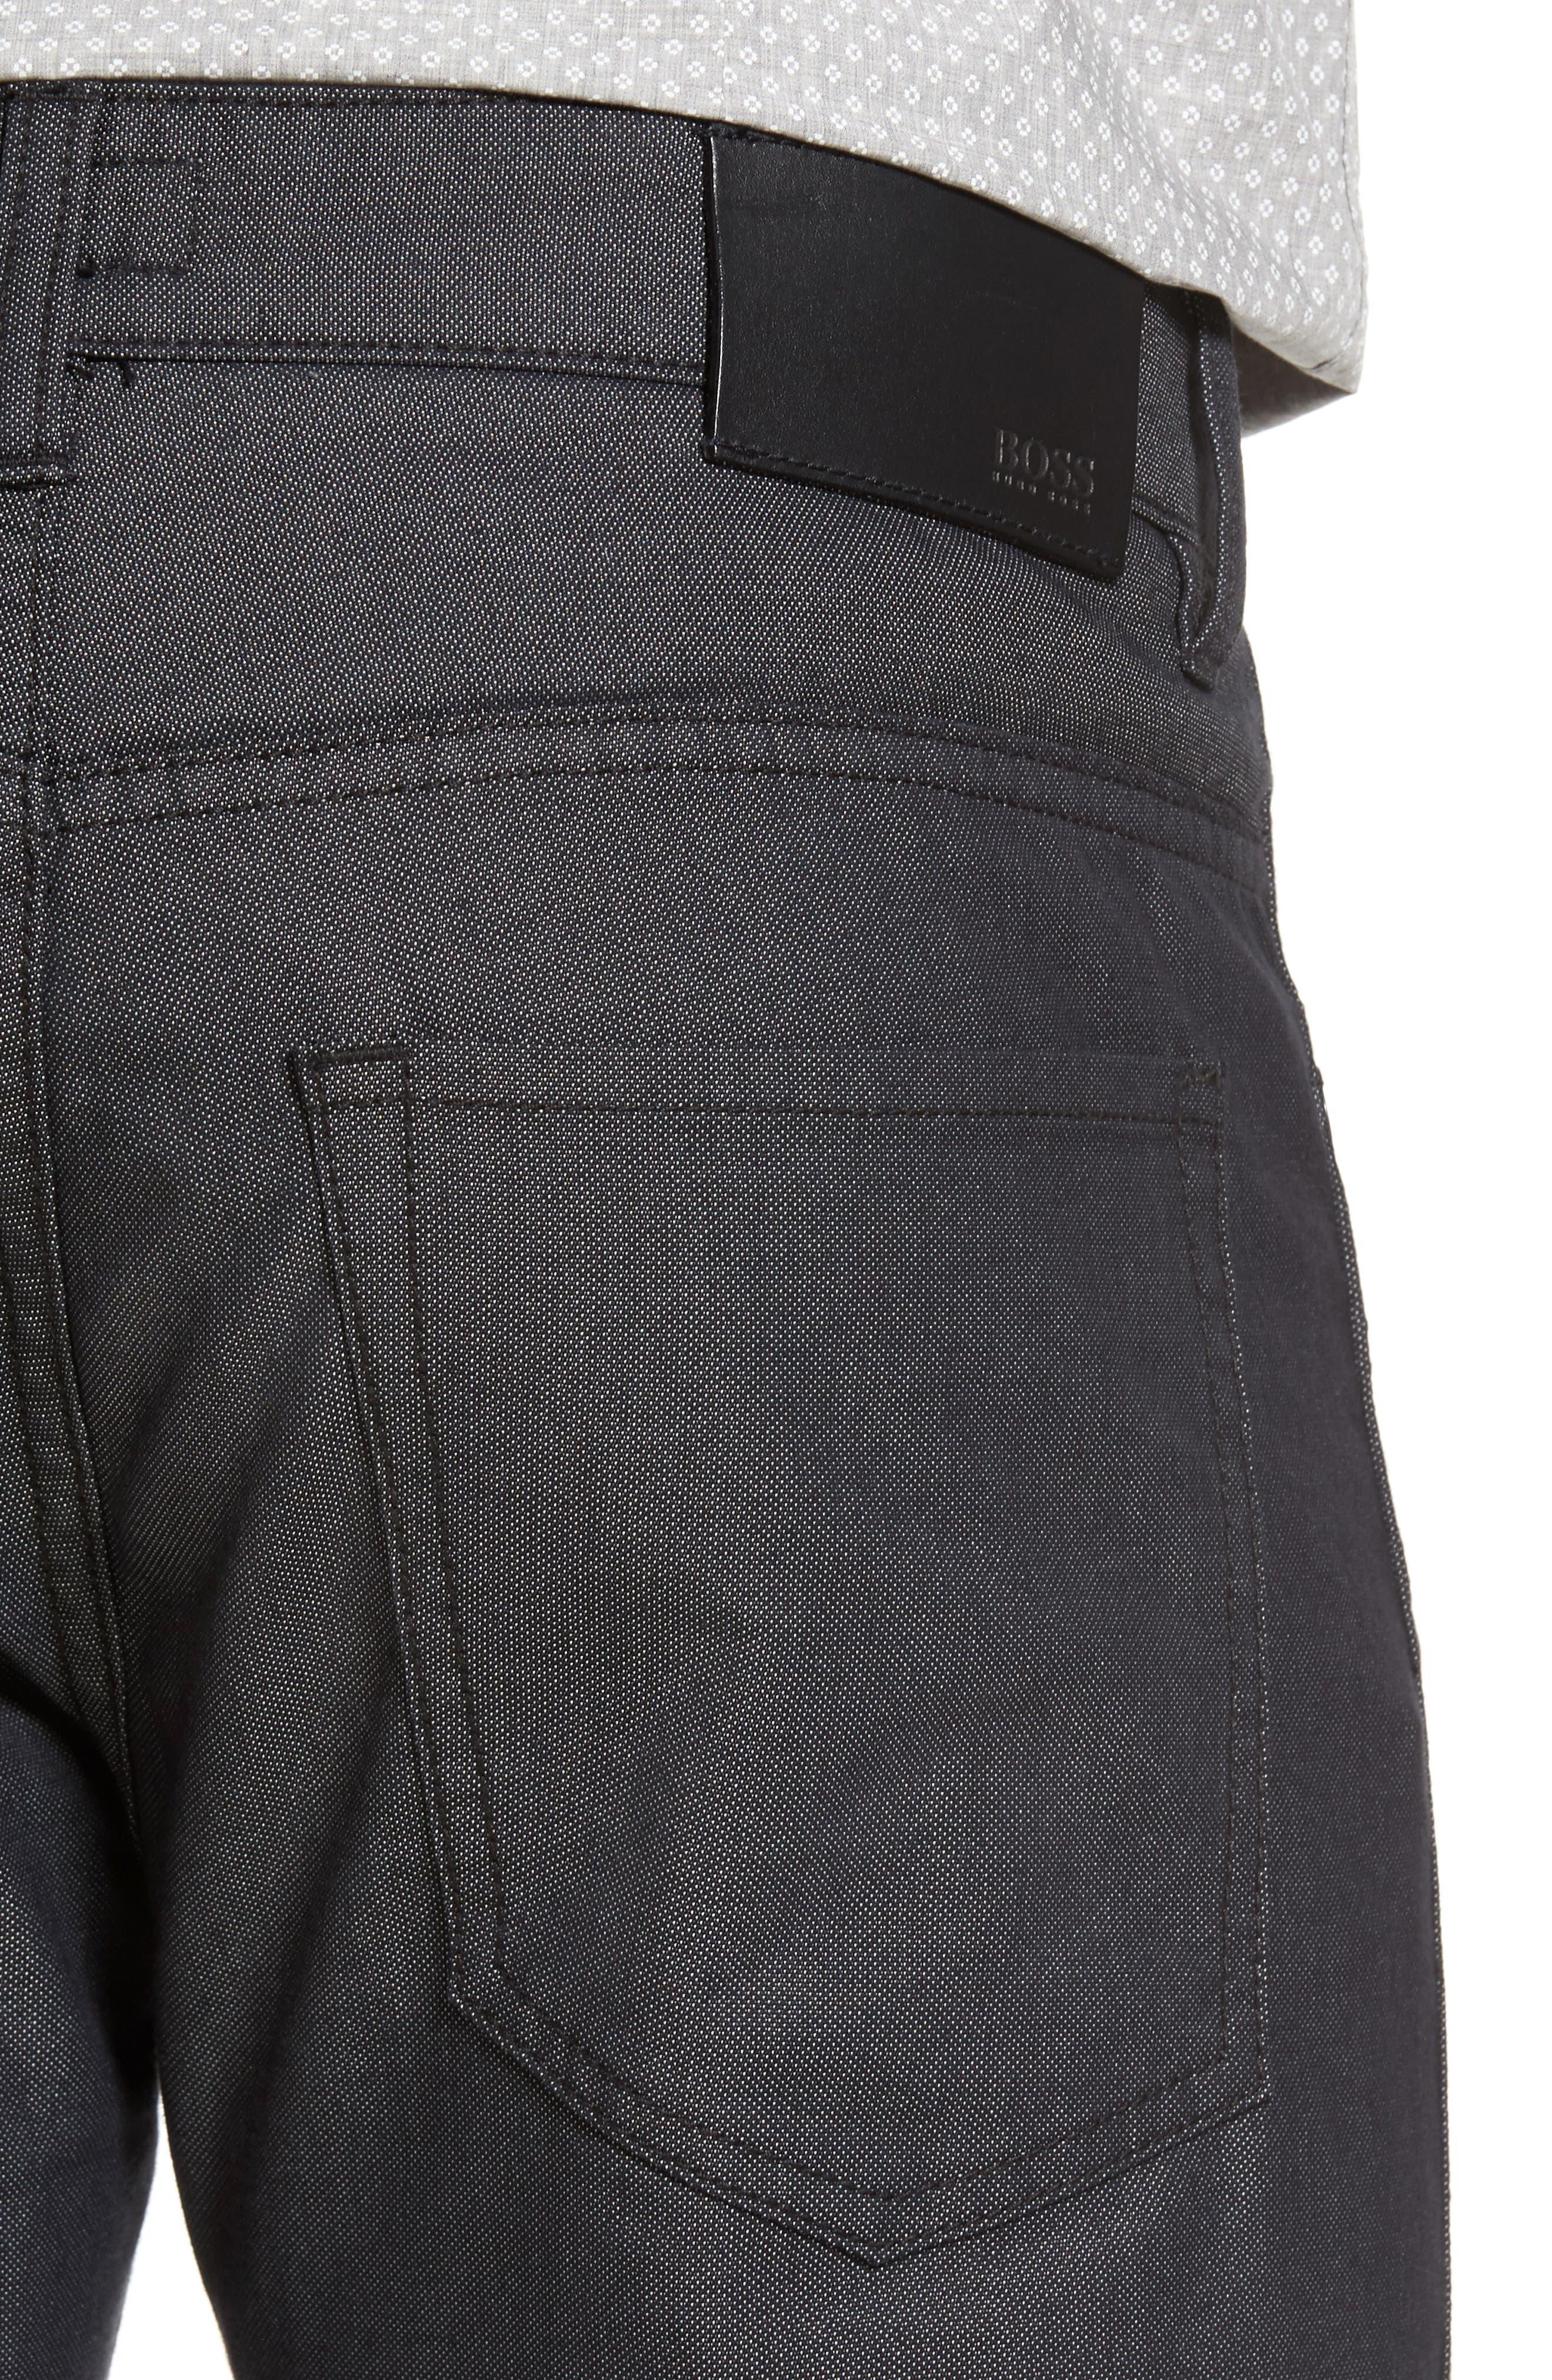 Delaware 5-Pocket Pants,                             Alternate thumbnail 4, color,